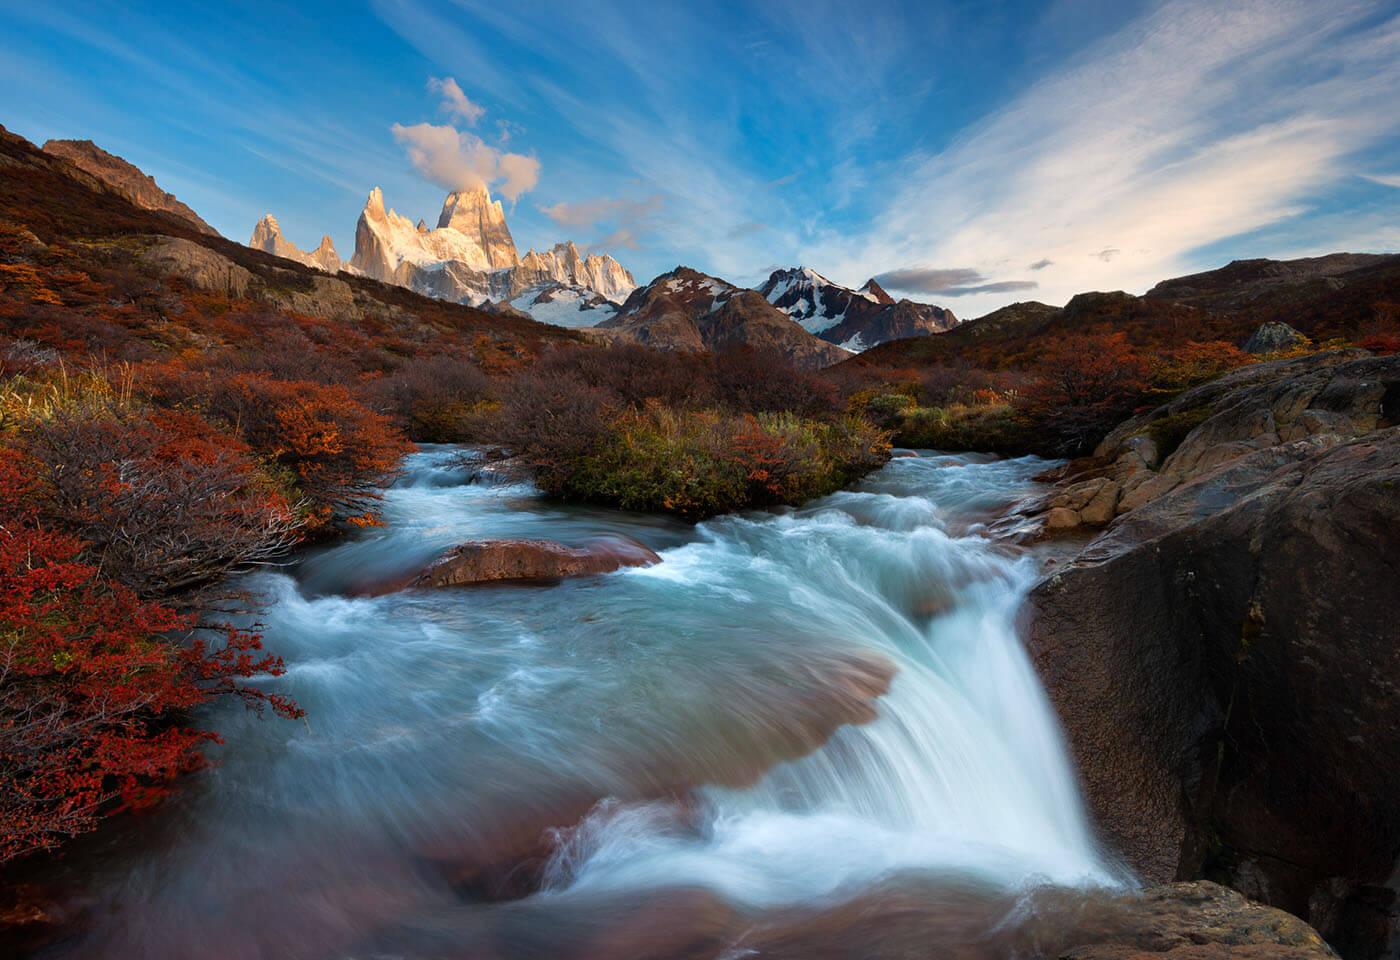 Landscape image of Patagonia